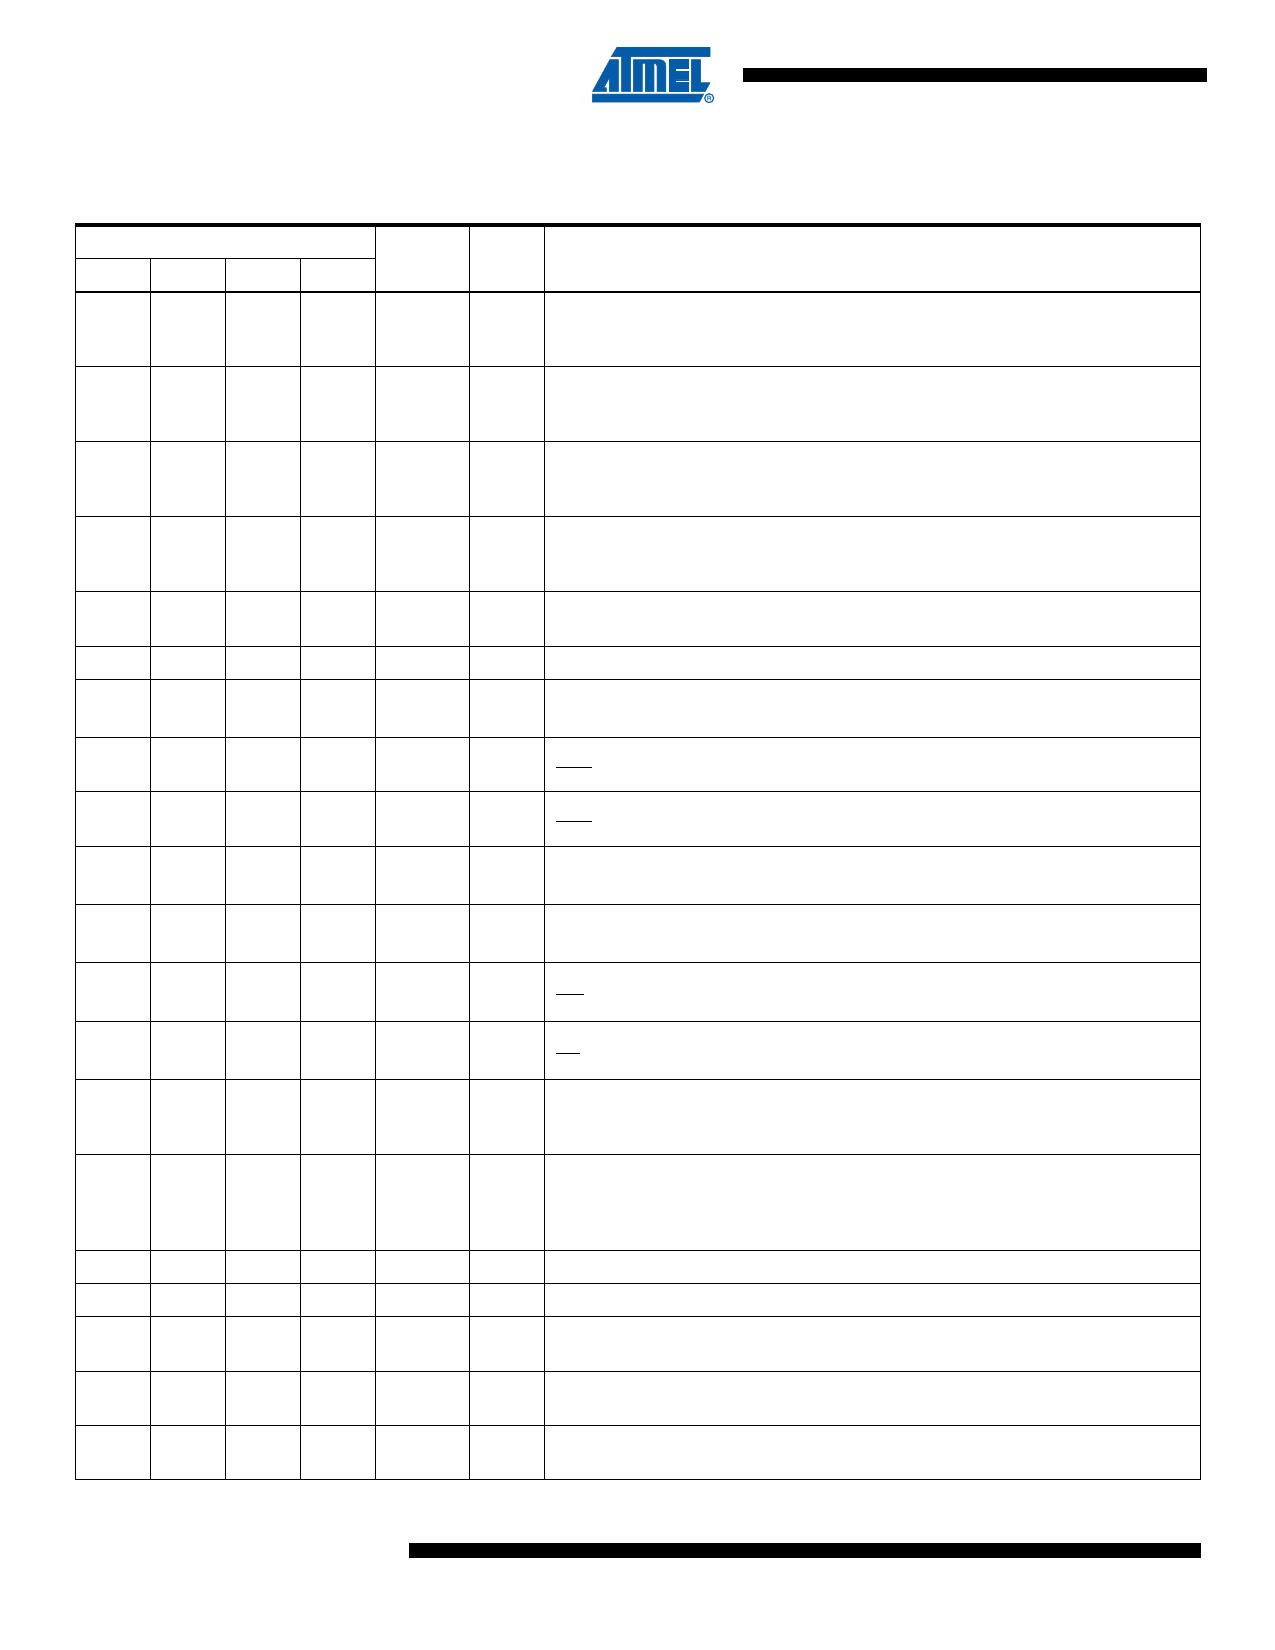 AT89LP51 pdf, 반도체, 판매, 대치품